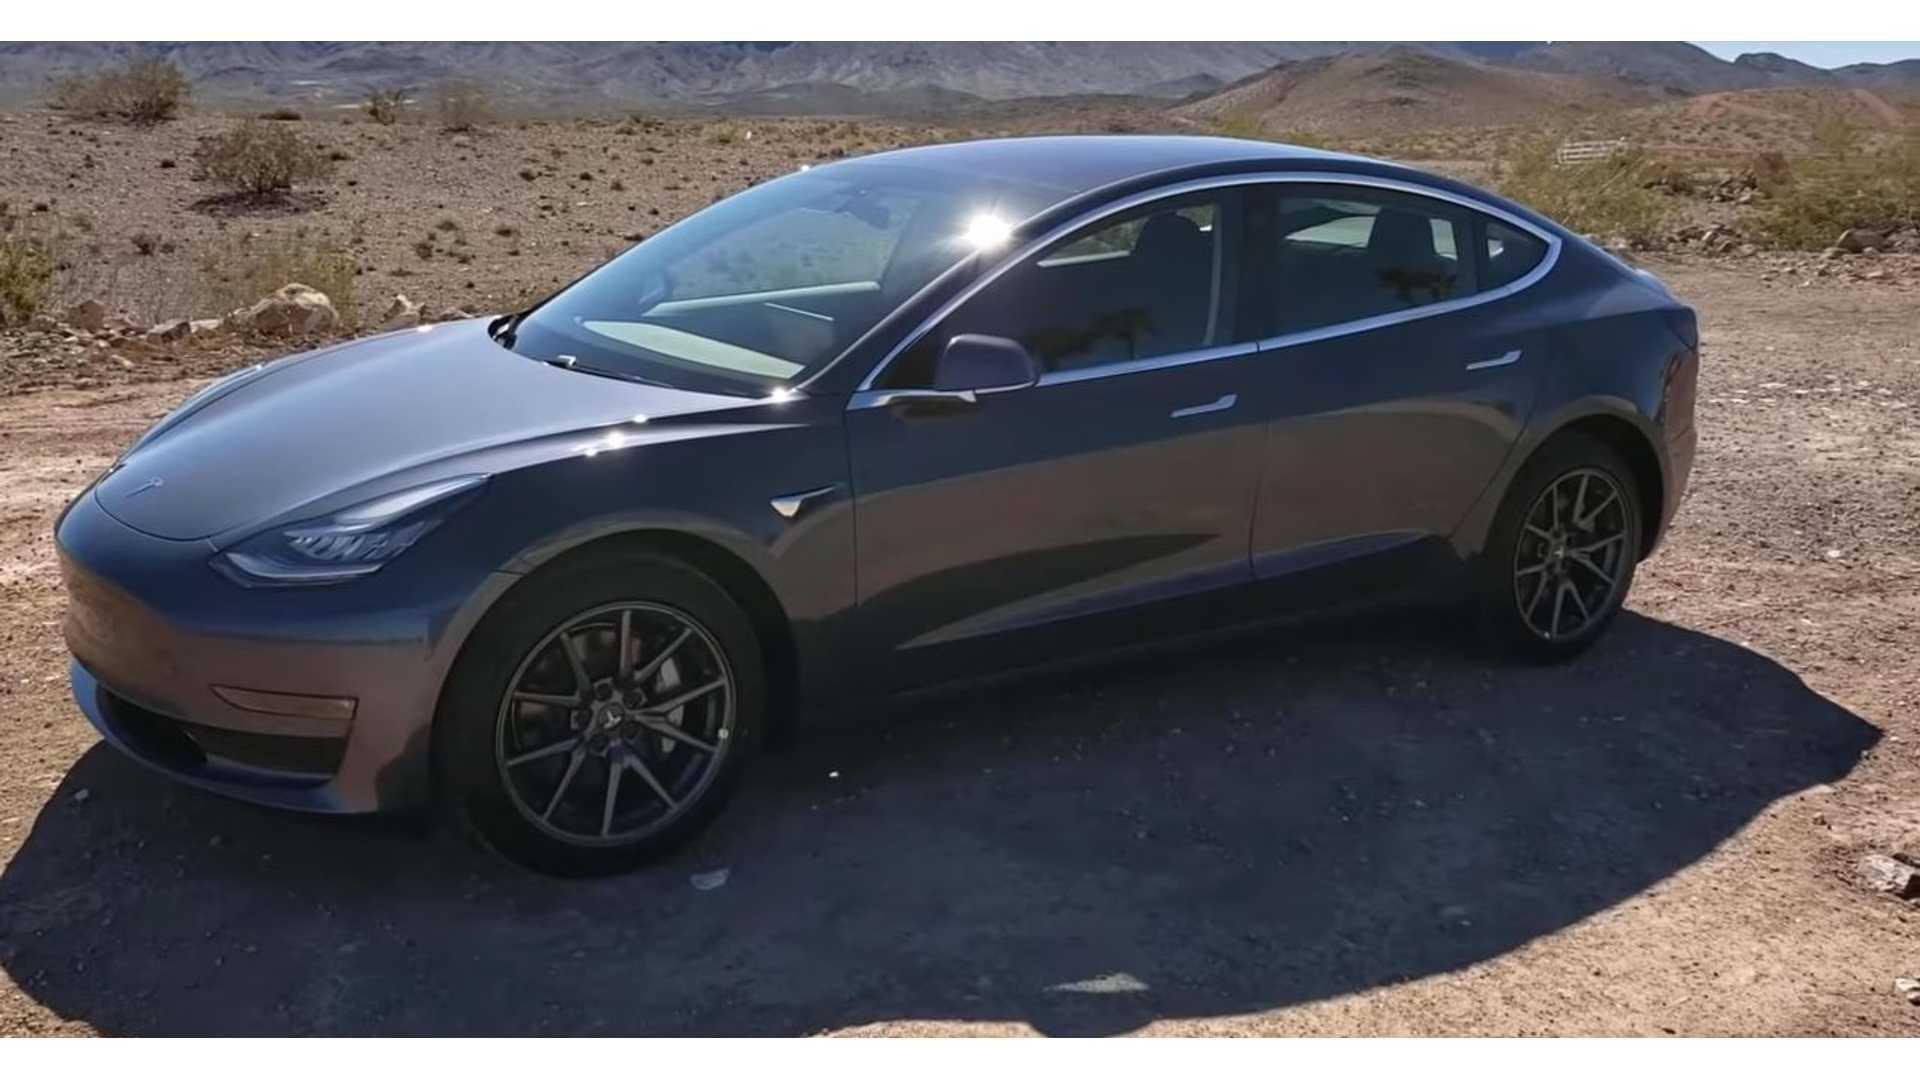 Concise Video Tour Of Tesla Model 3 Standard Range Plus